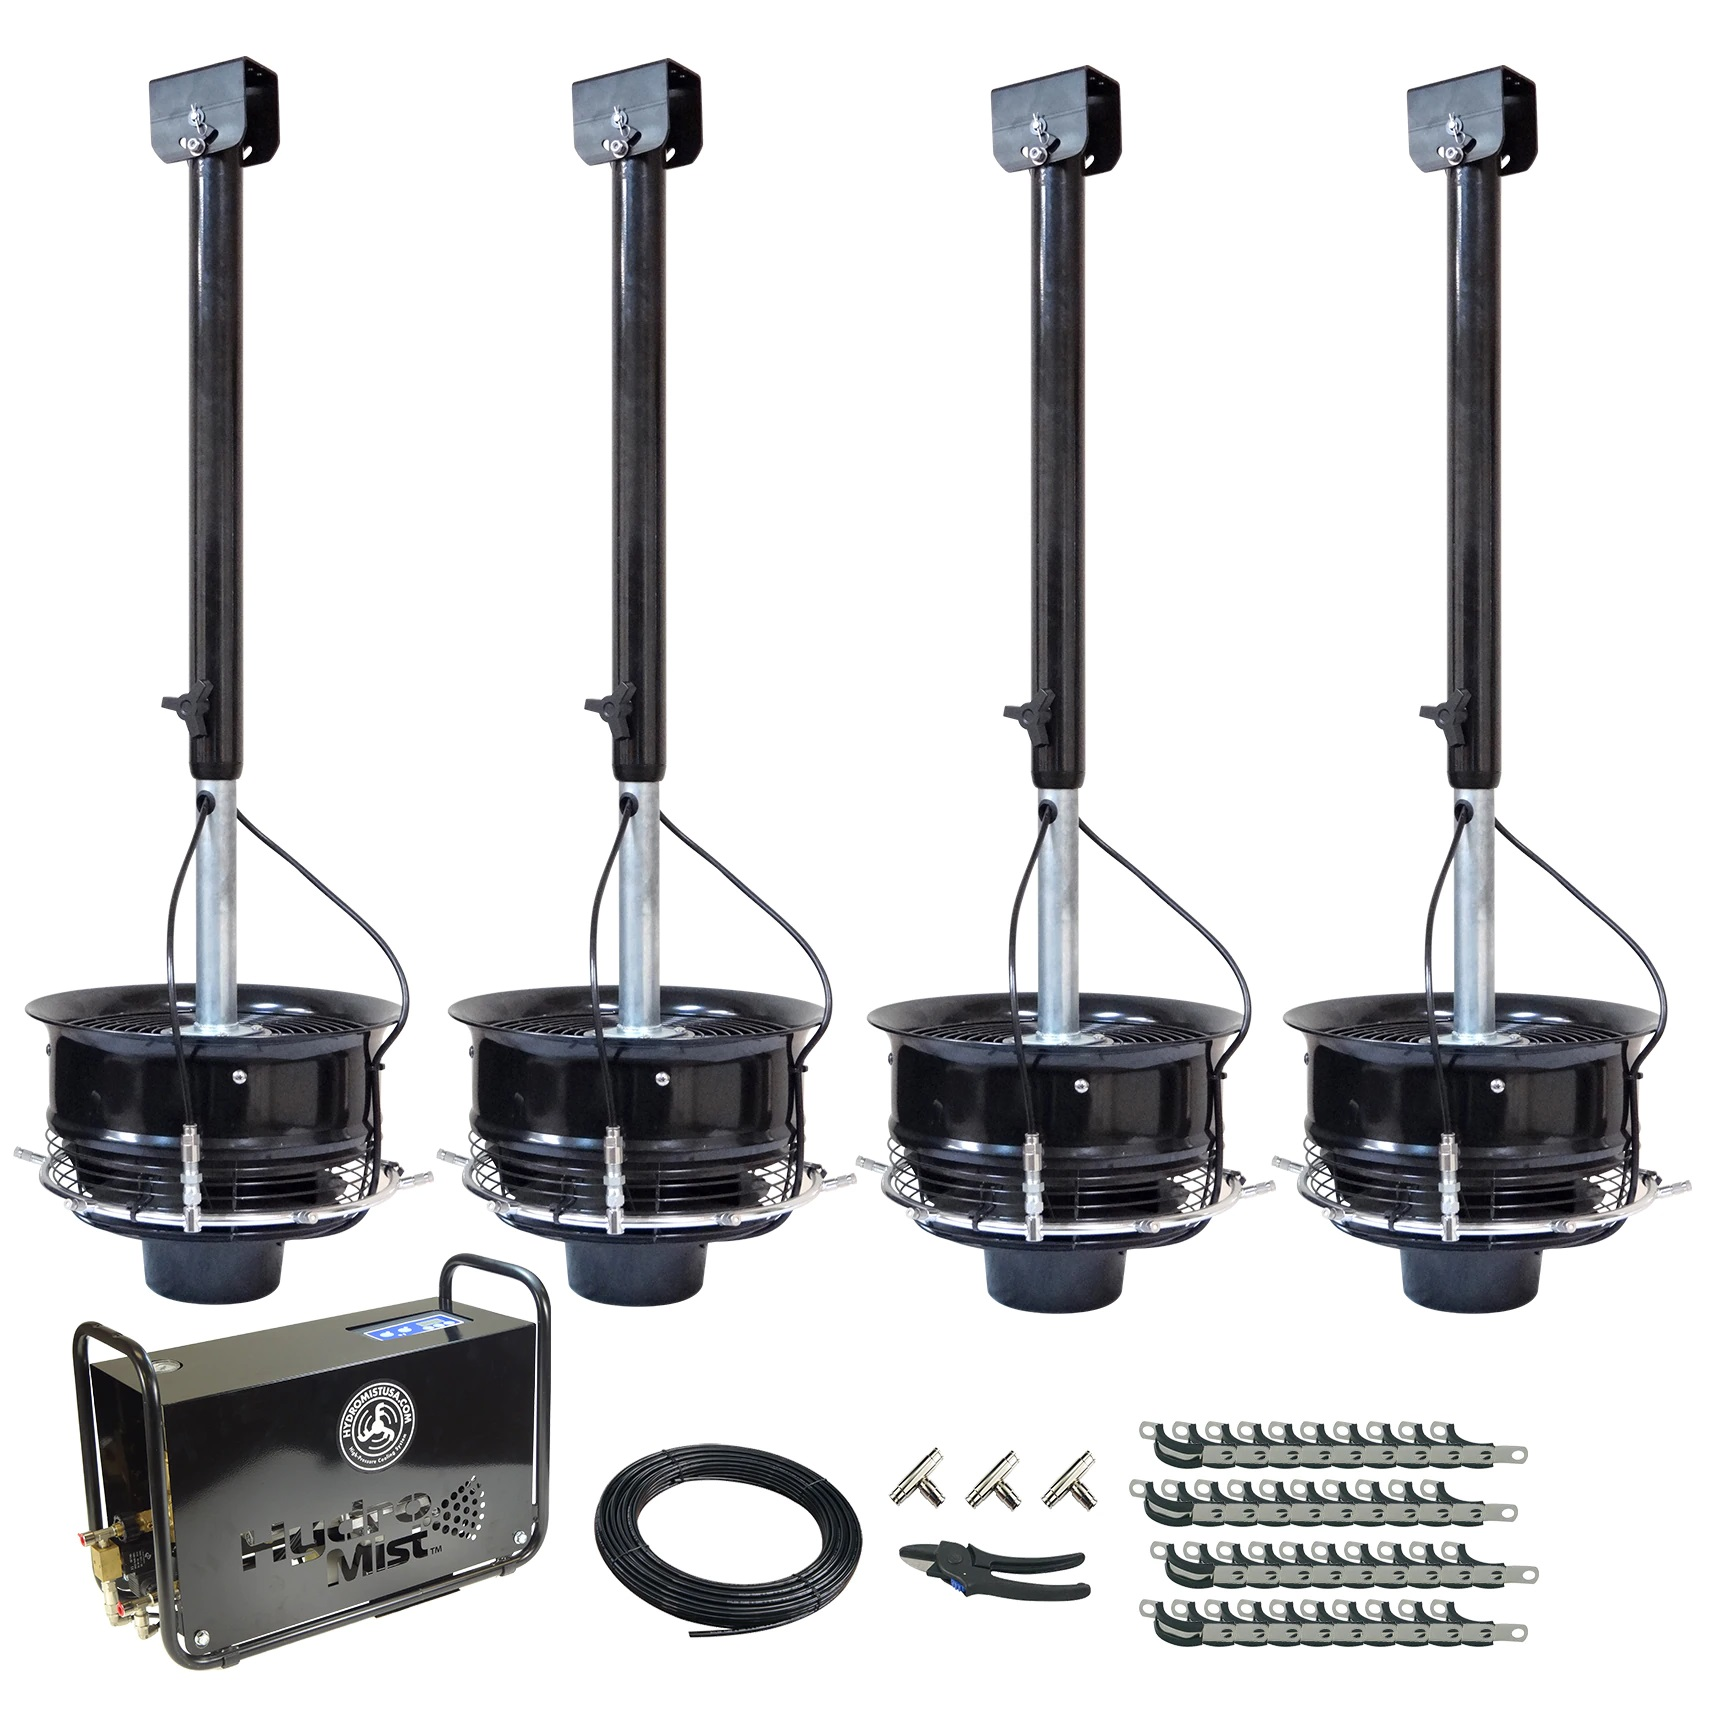 4 CentraMist Ceiling Mount Fans with Digi Pro Pump Package Black